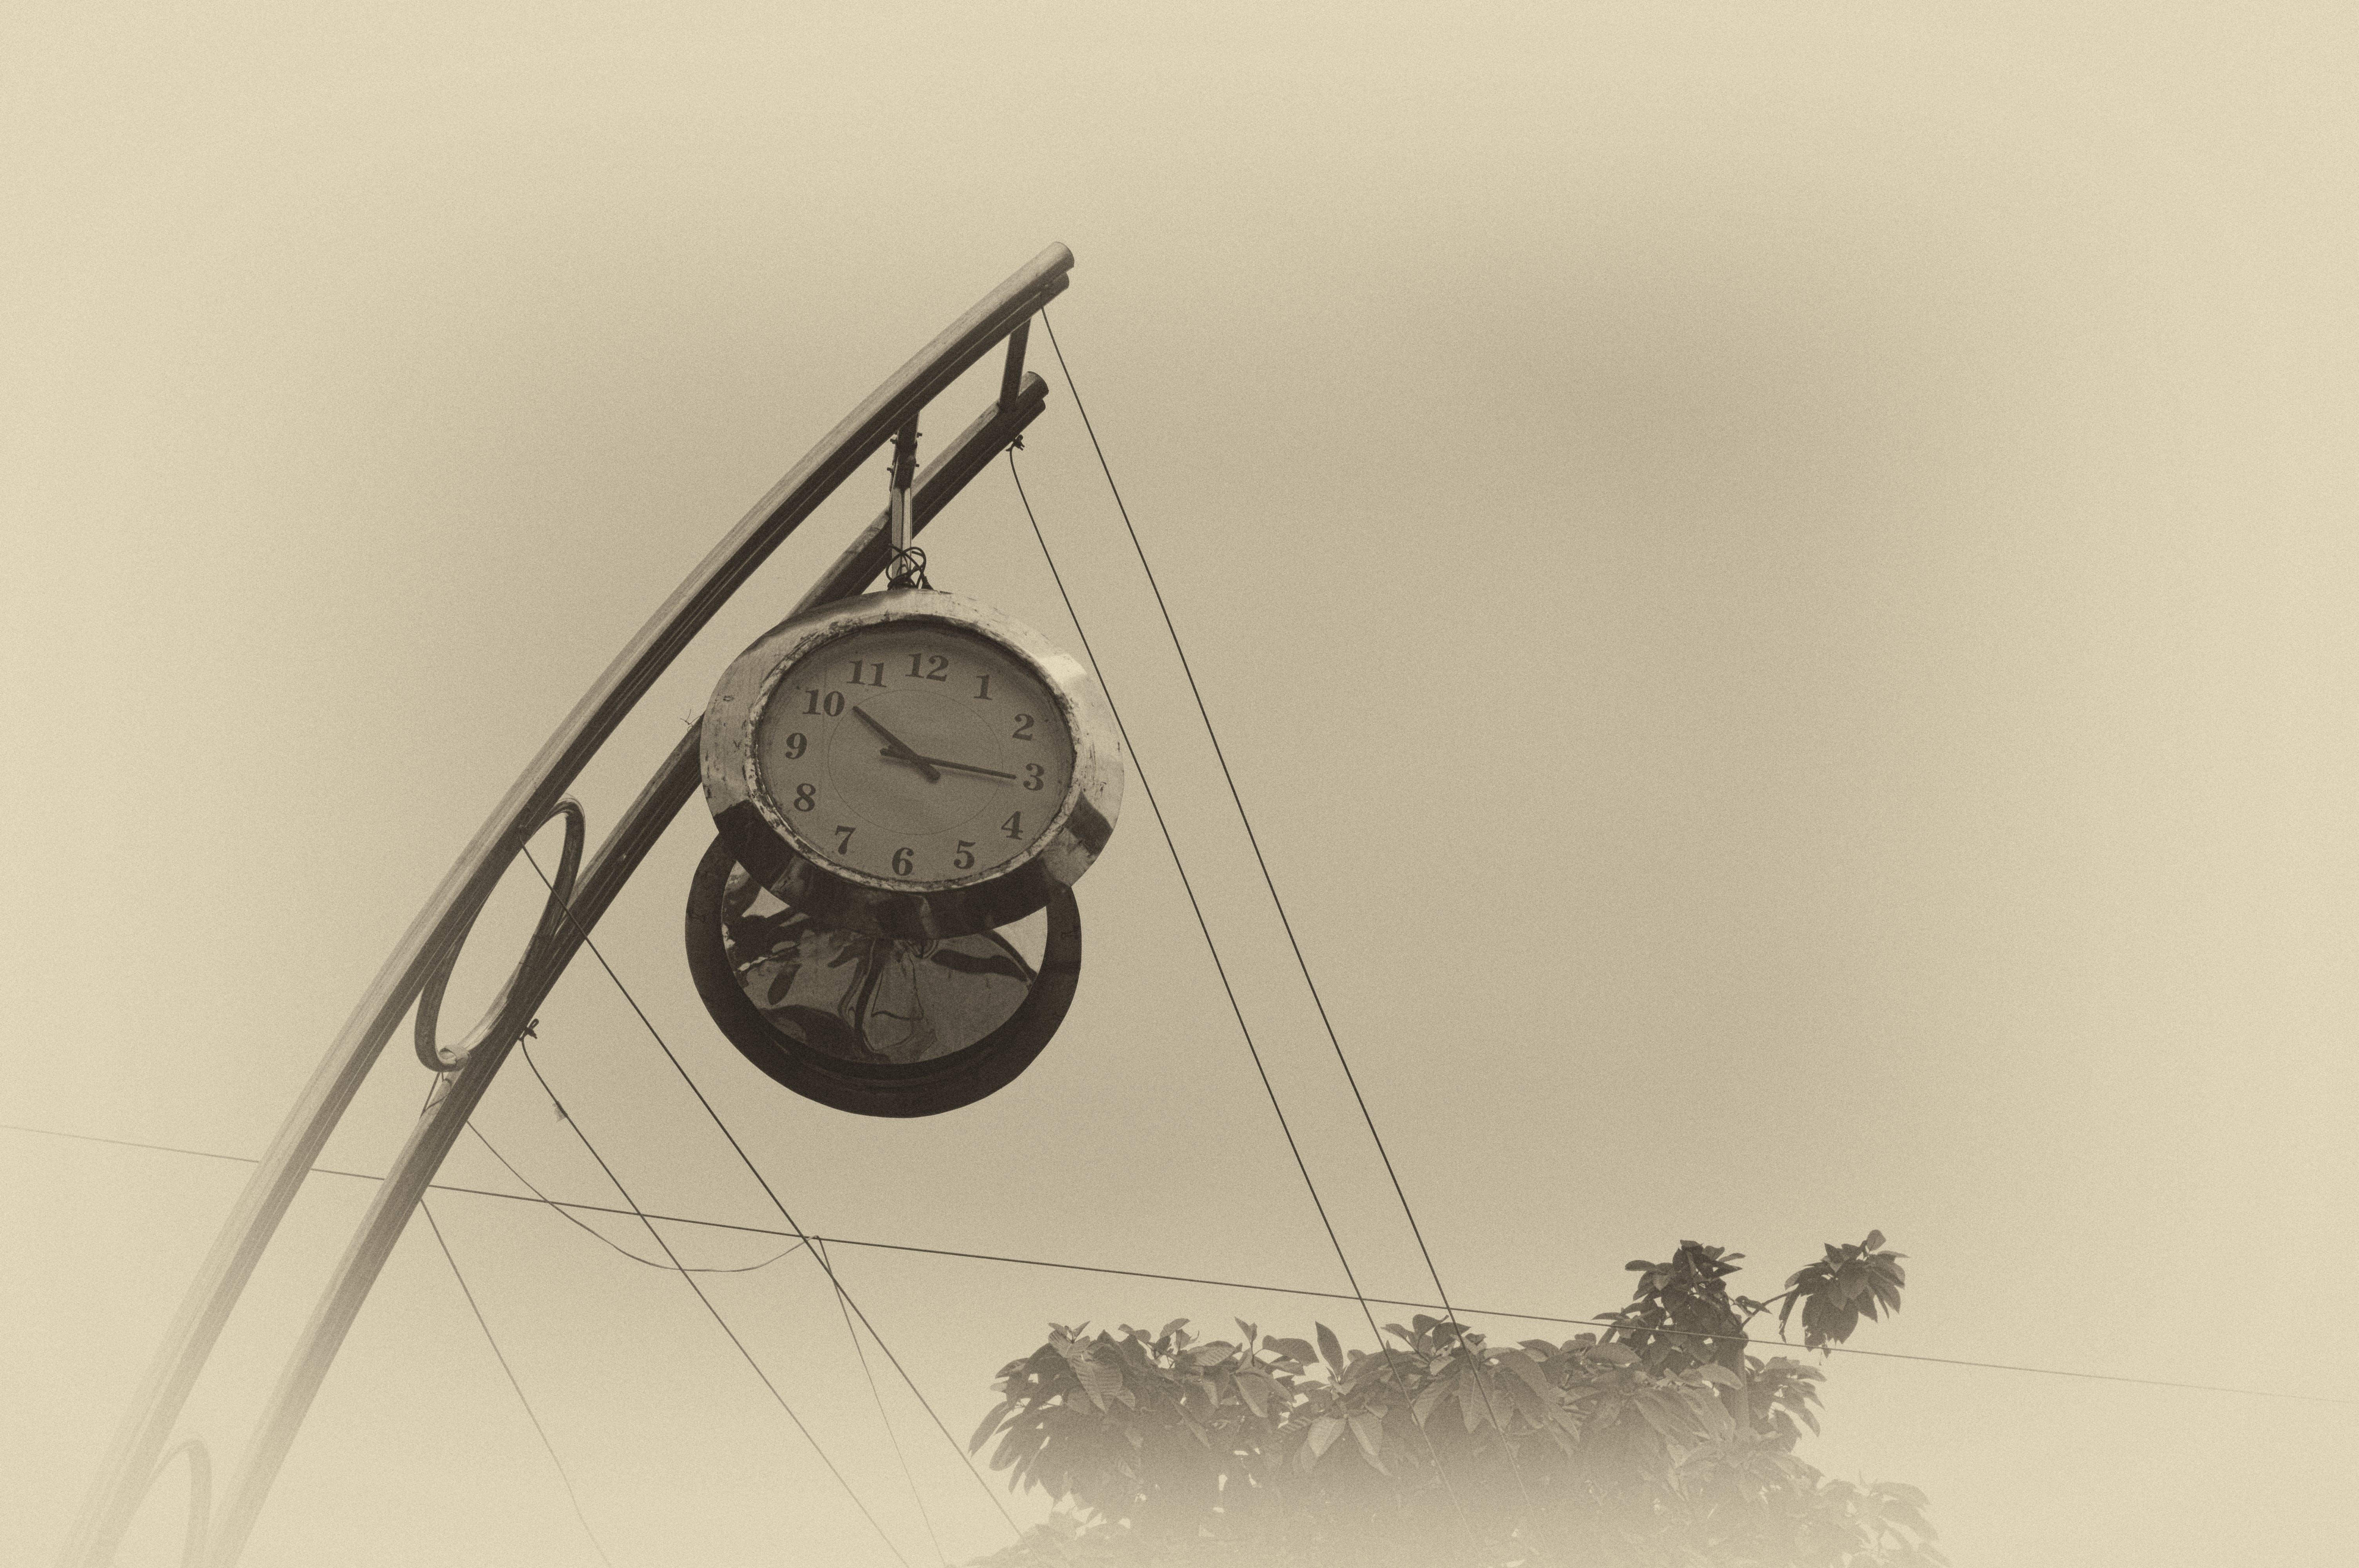 Free stock photo of city, clock tower, street, street art